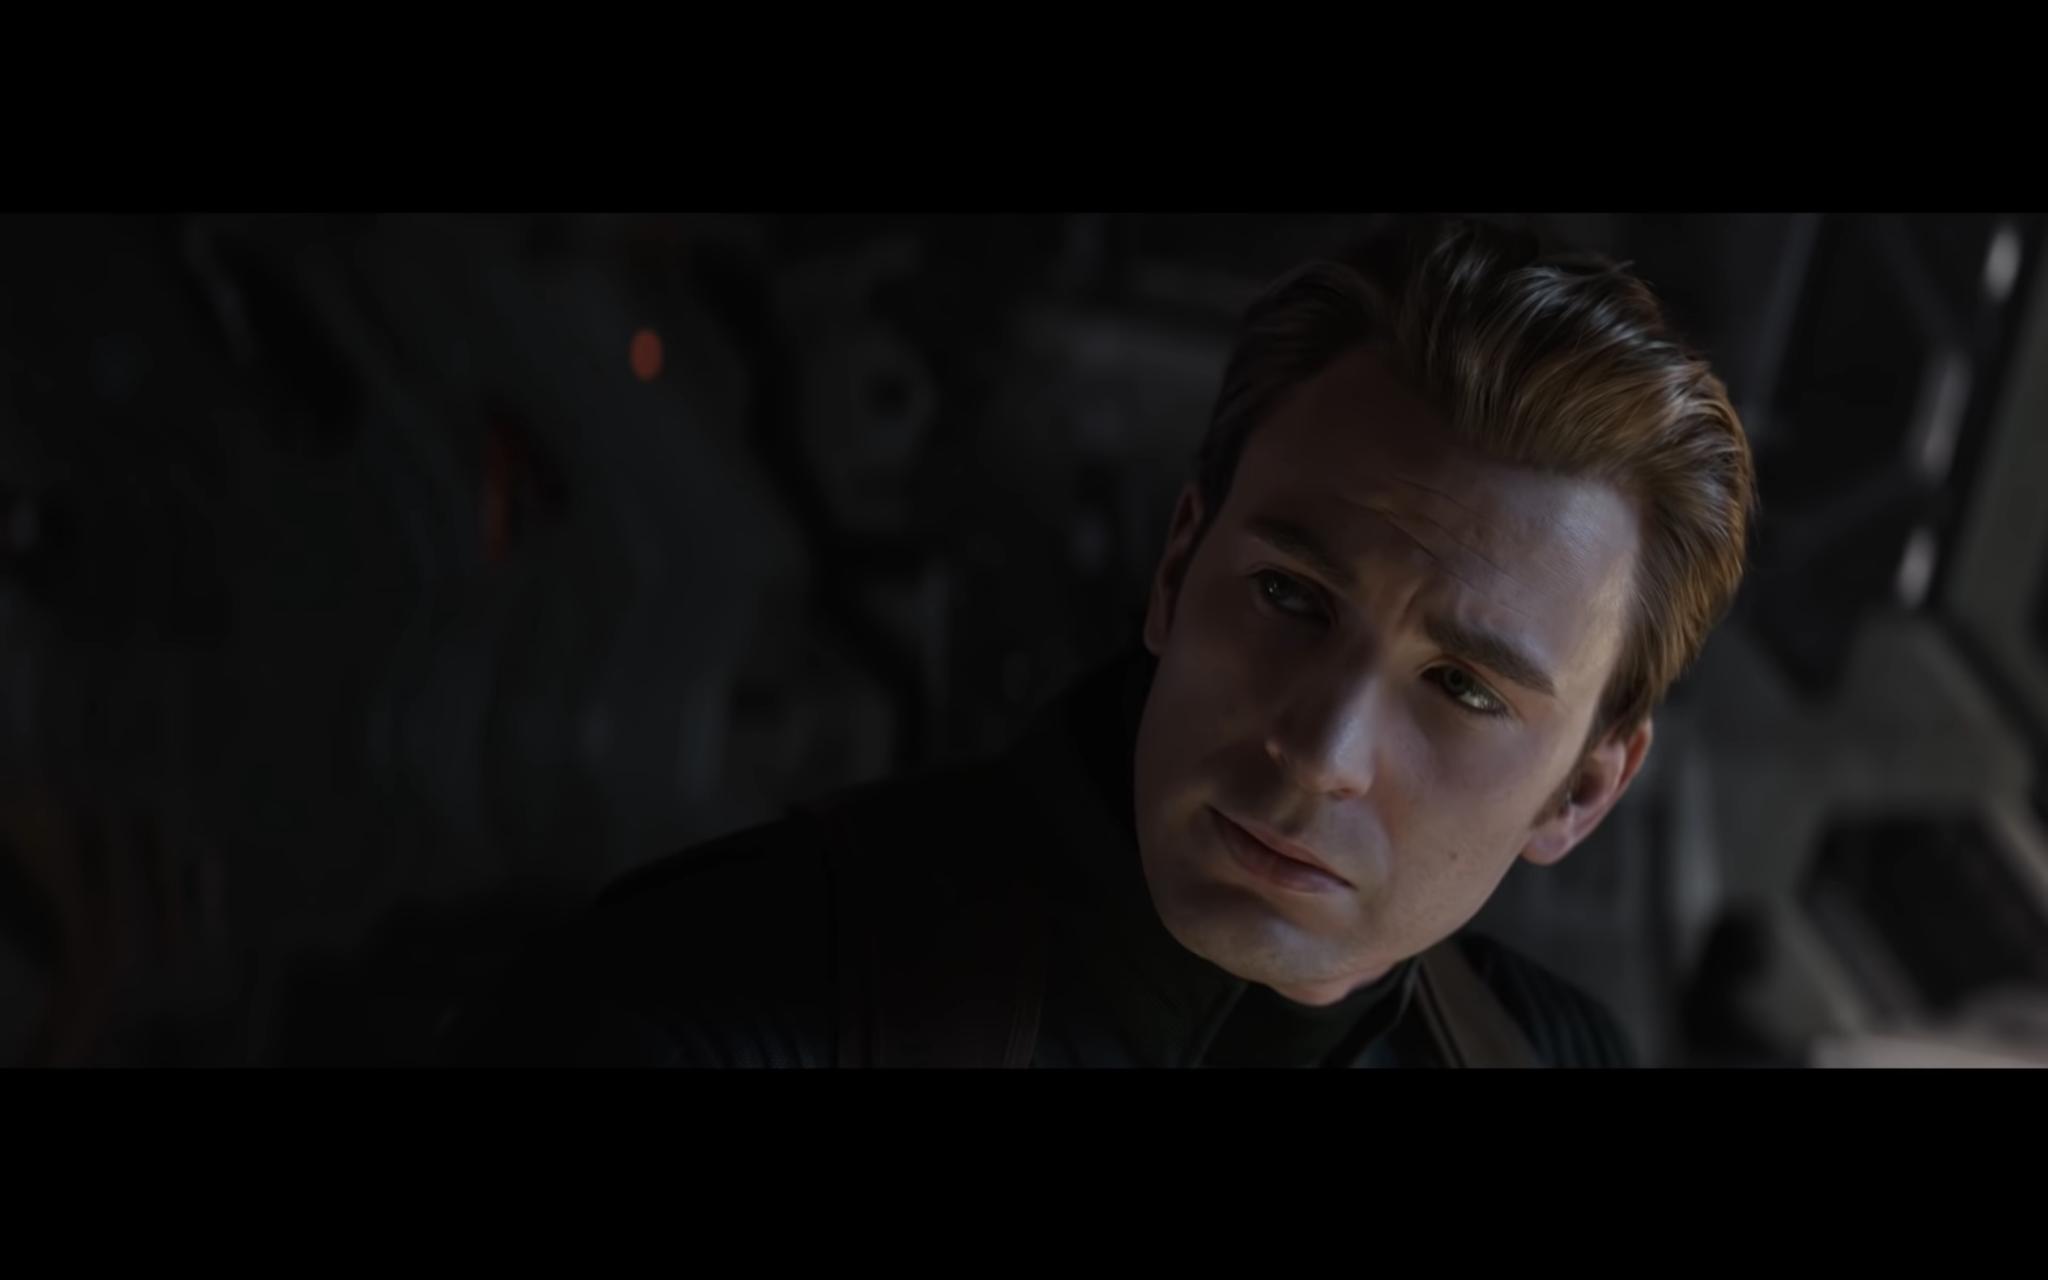 Endgame Trailer Photo: 'Avengers: Endgame' Trailer Smashes 24-hour Video Views